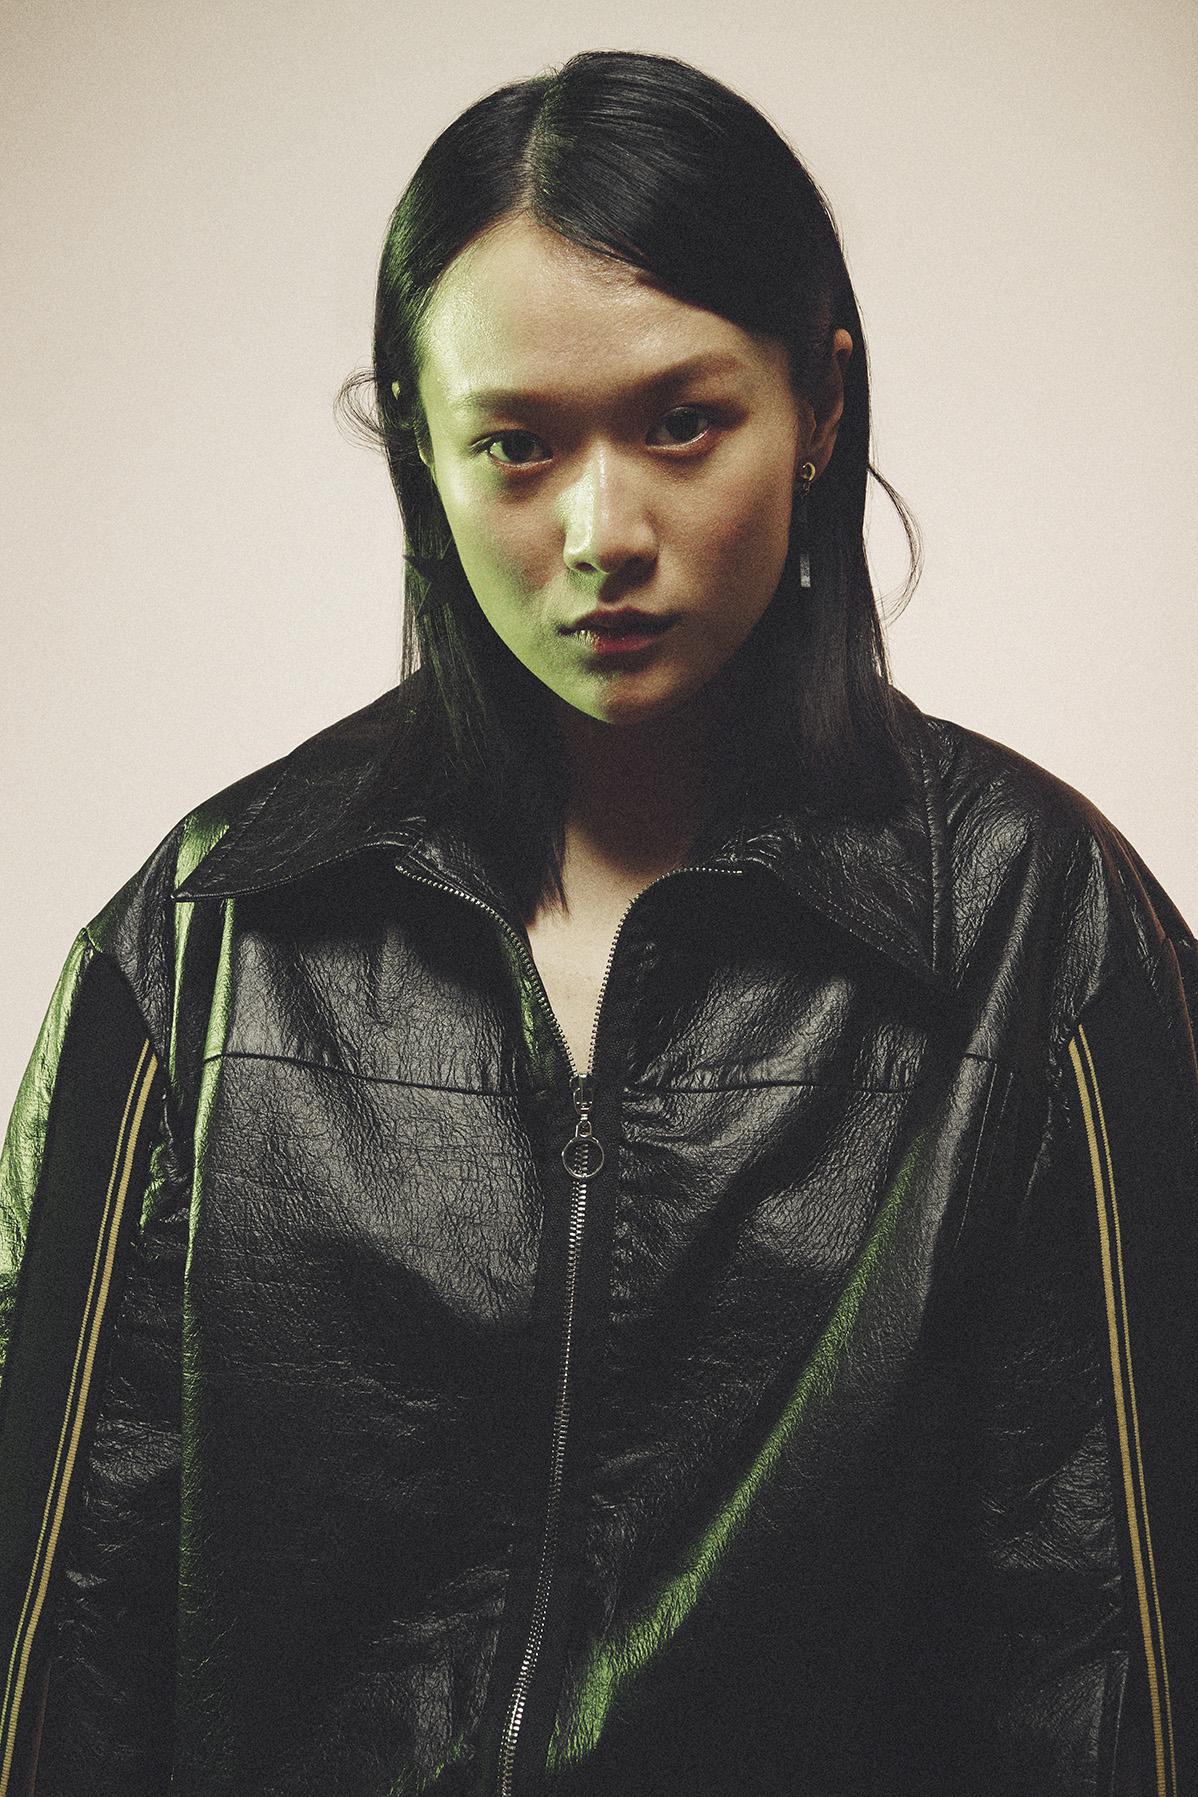 PATH PATHMEN JanineGrosche Genderfluid Transseasonal Menswear Mensfashion Fashion SS17 Gucci